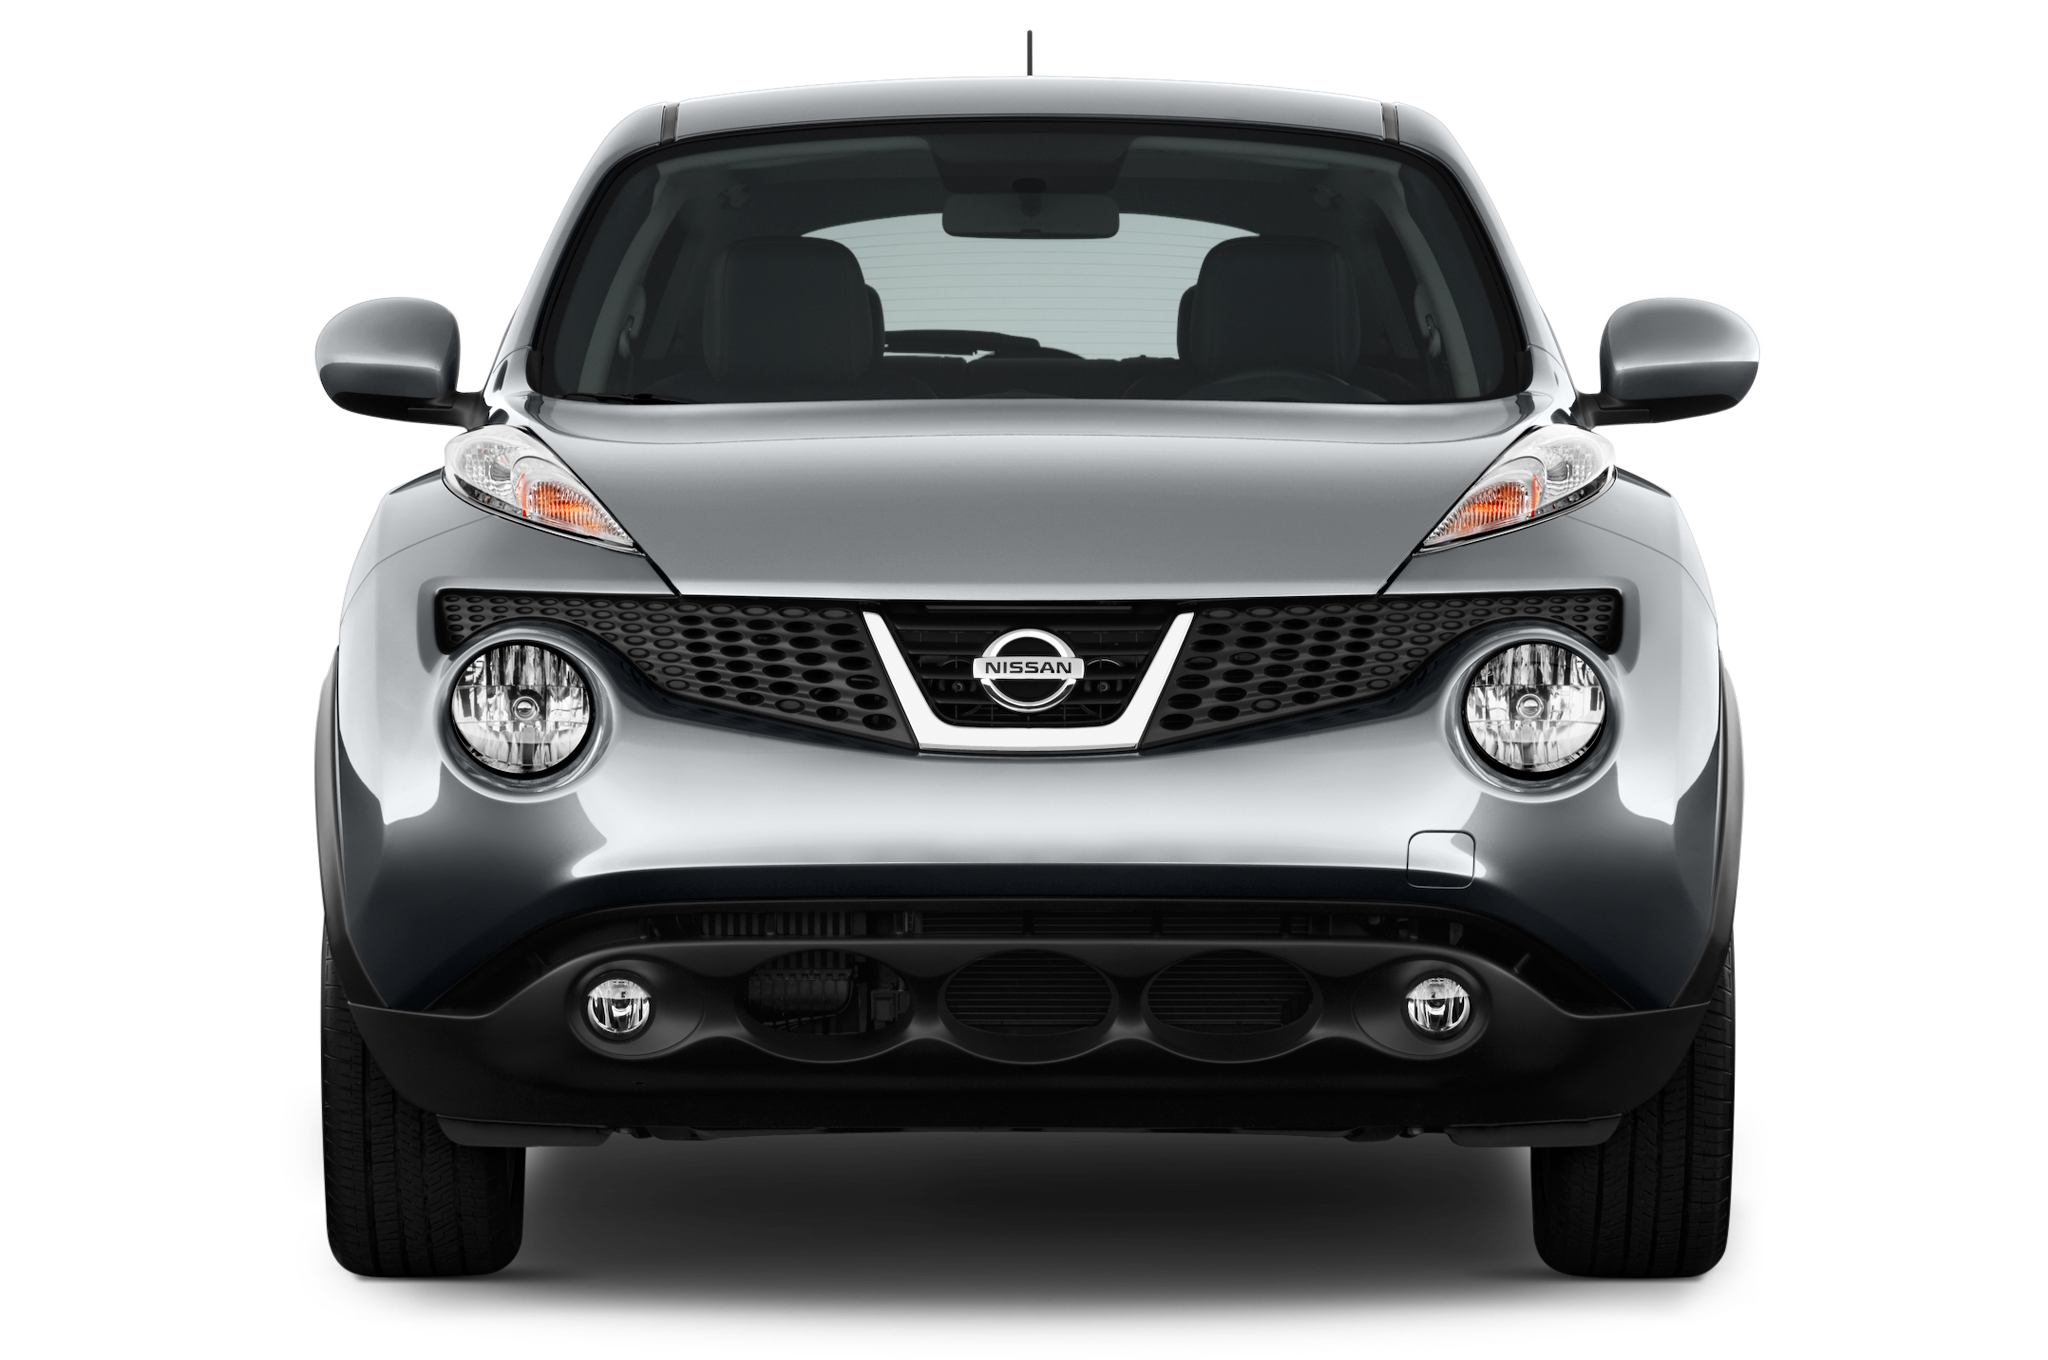 Nissan PNG Image Nissan juke, Nissan, Mazda cars